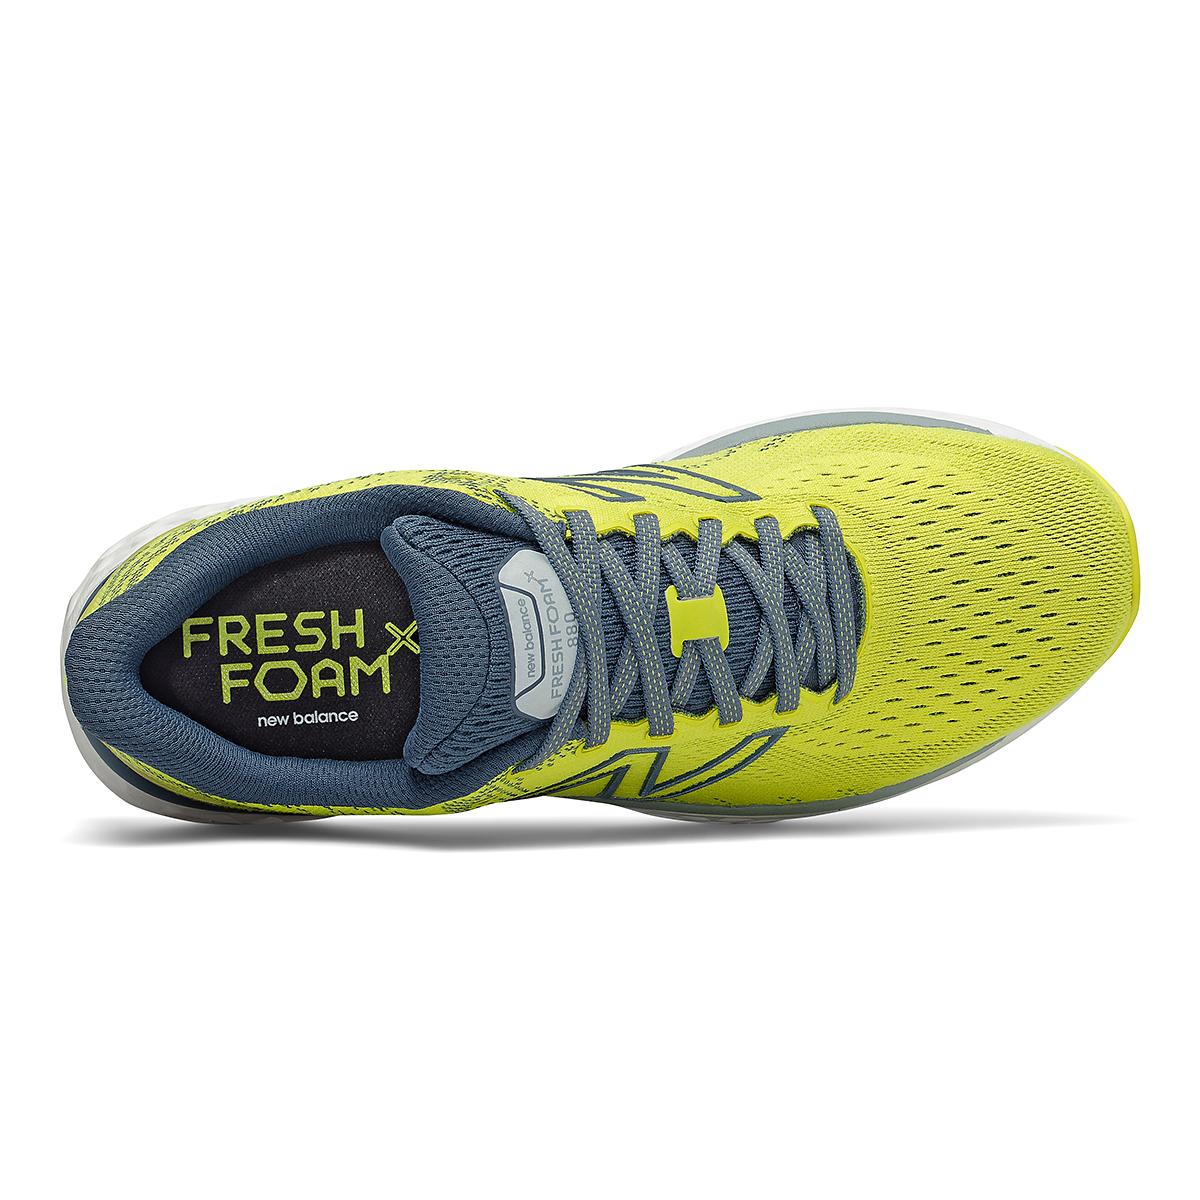 Men's New Balance Fresh Foam 880v11 Running Shoe - Color: Sulphur Yellow/Deep Ocean Grey - Size: 7 - Width: Wide, Sulphur Yellow/Deep Ocean Grey, large, image 4